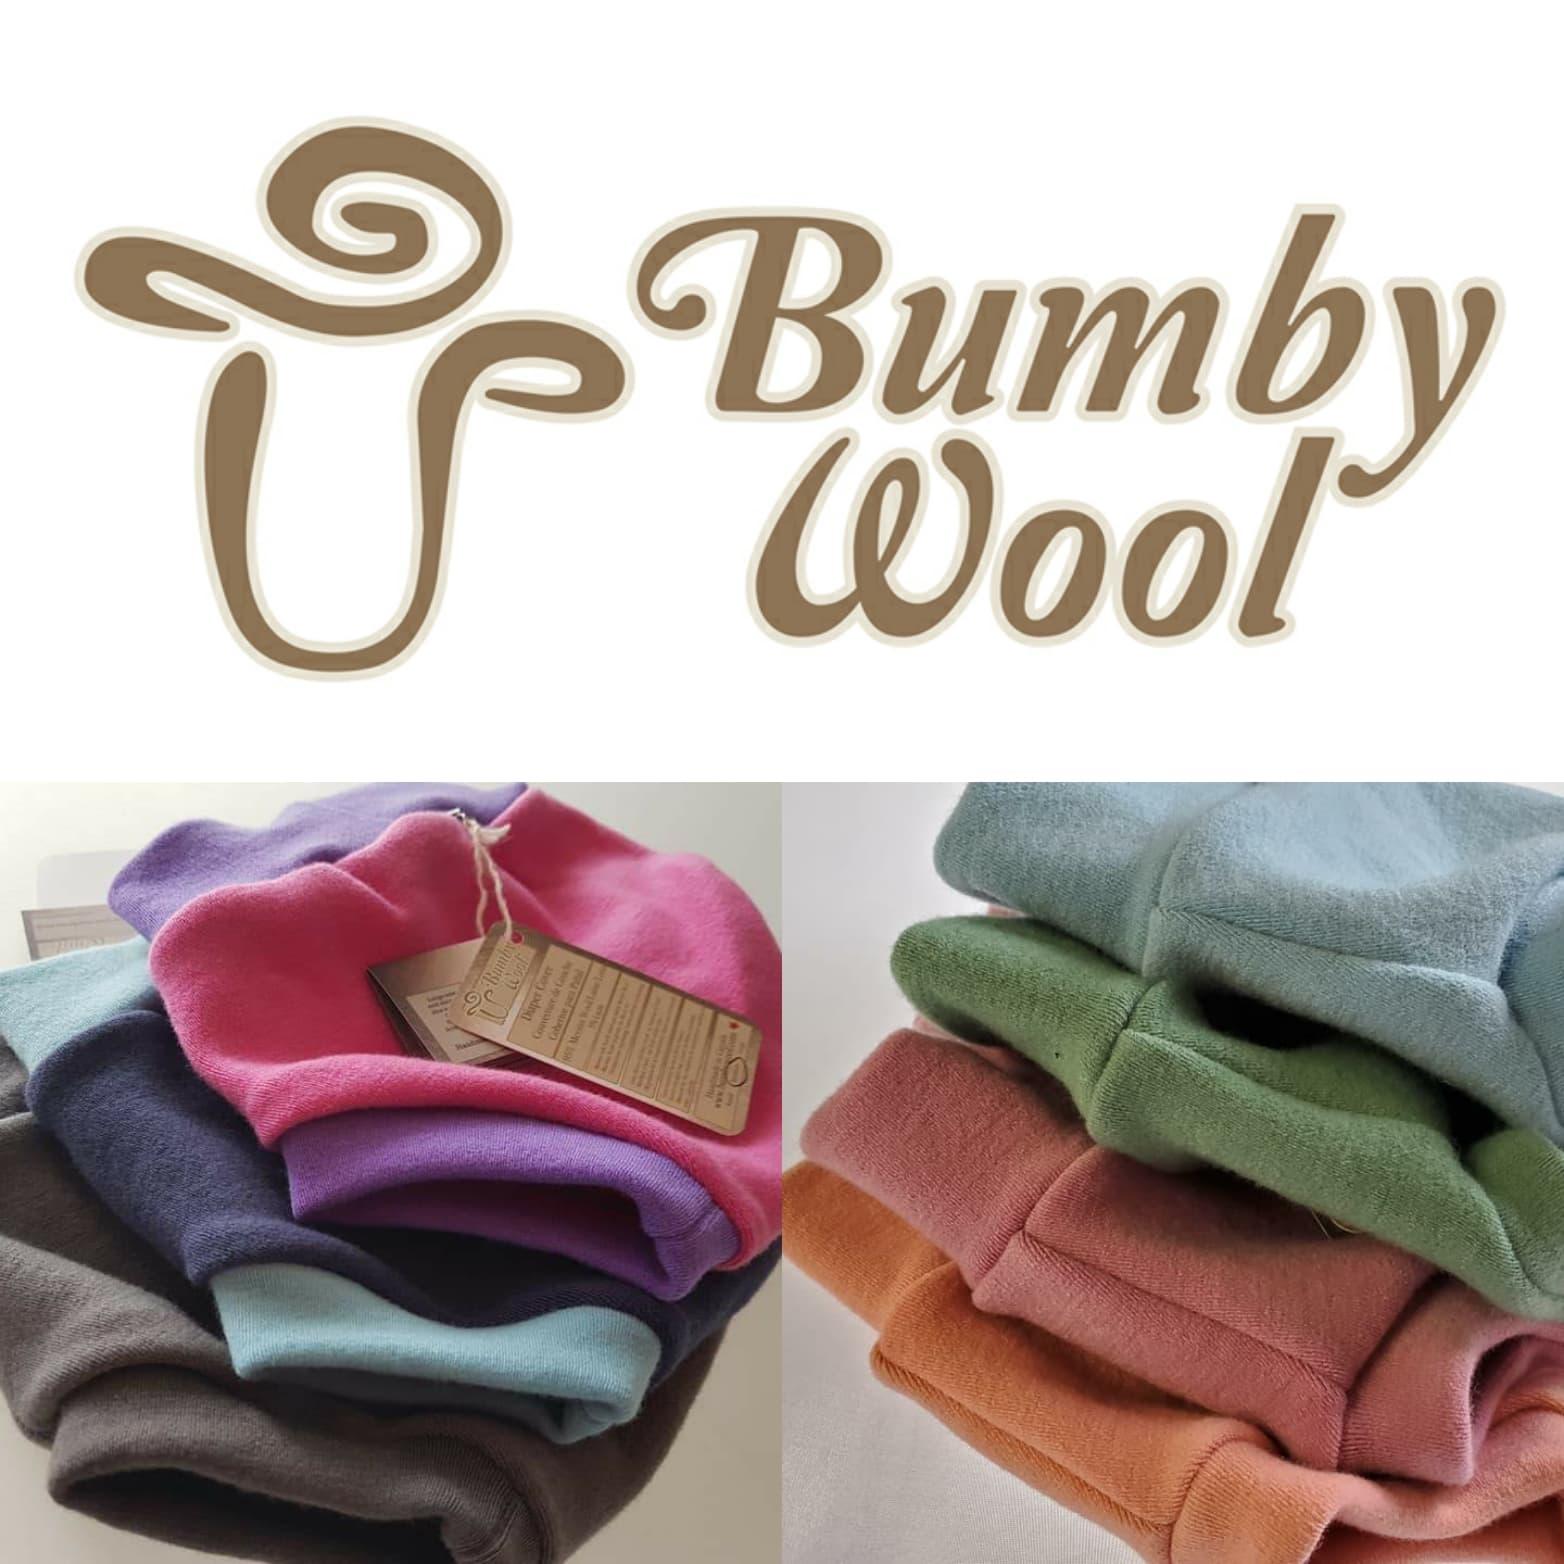 Bumby Wool